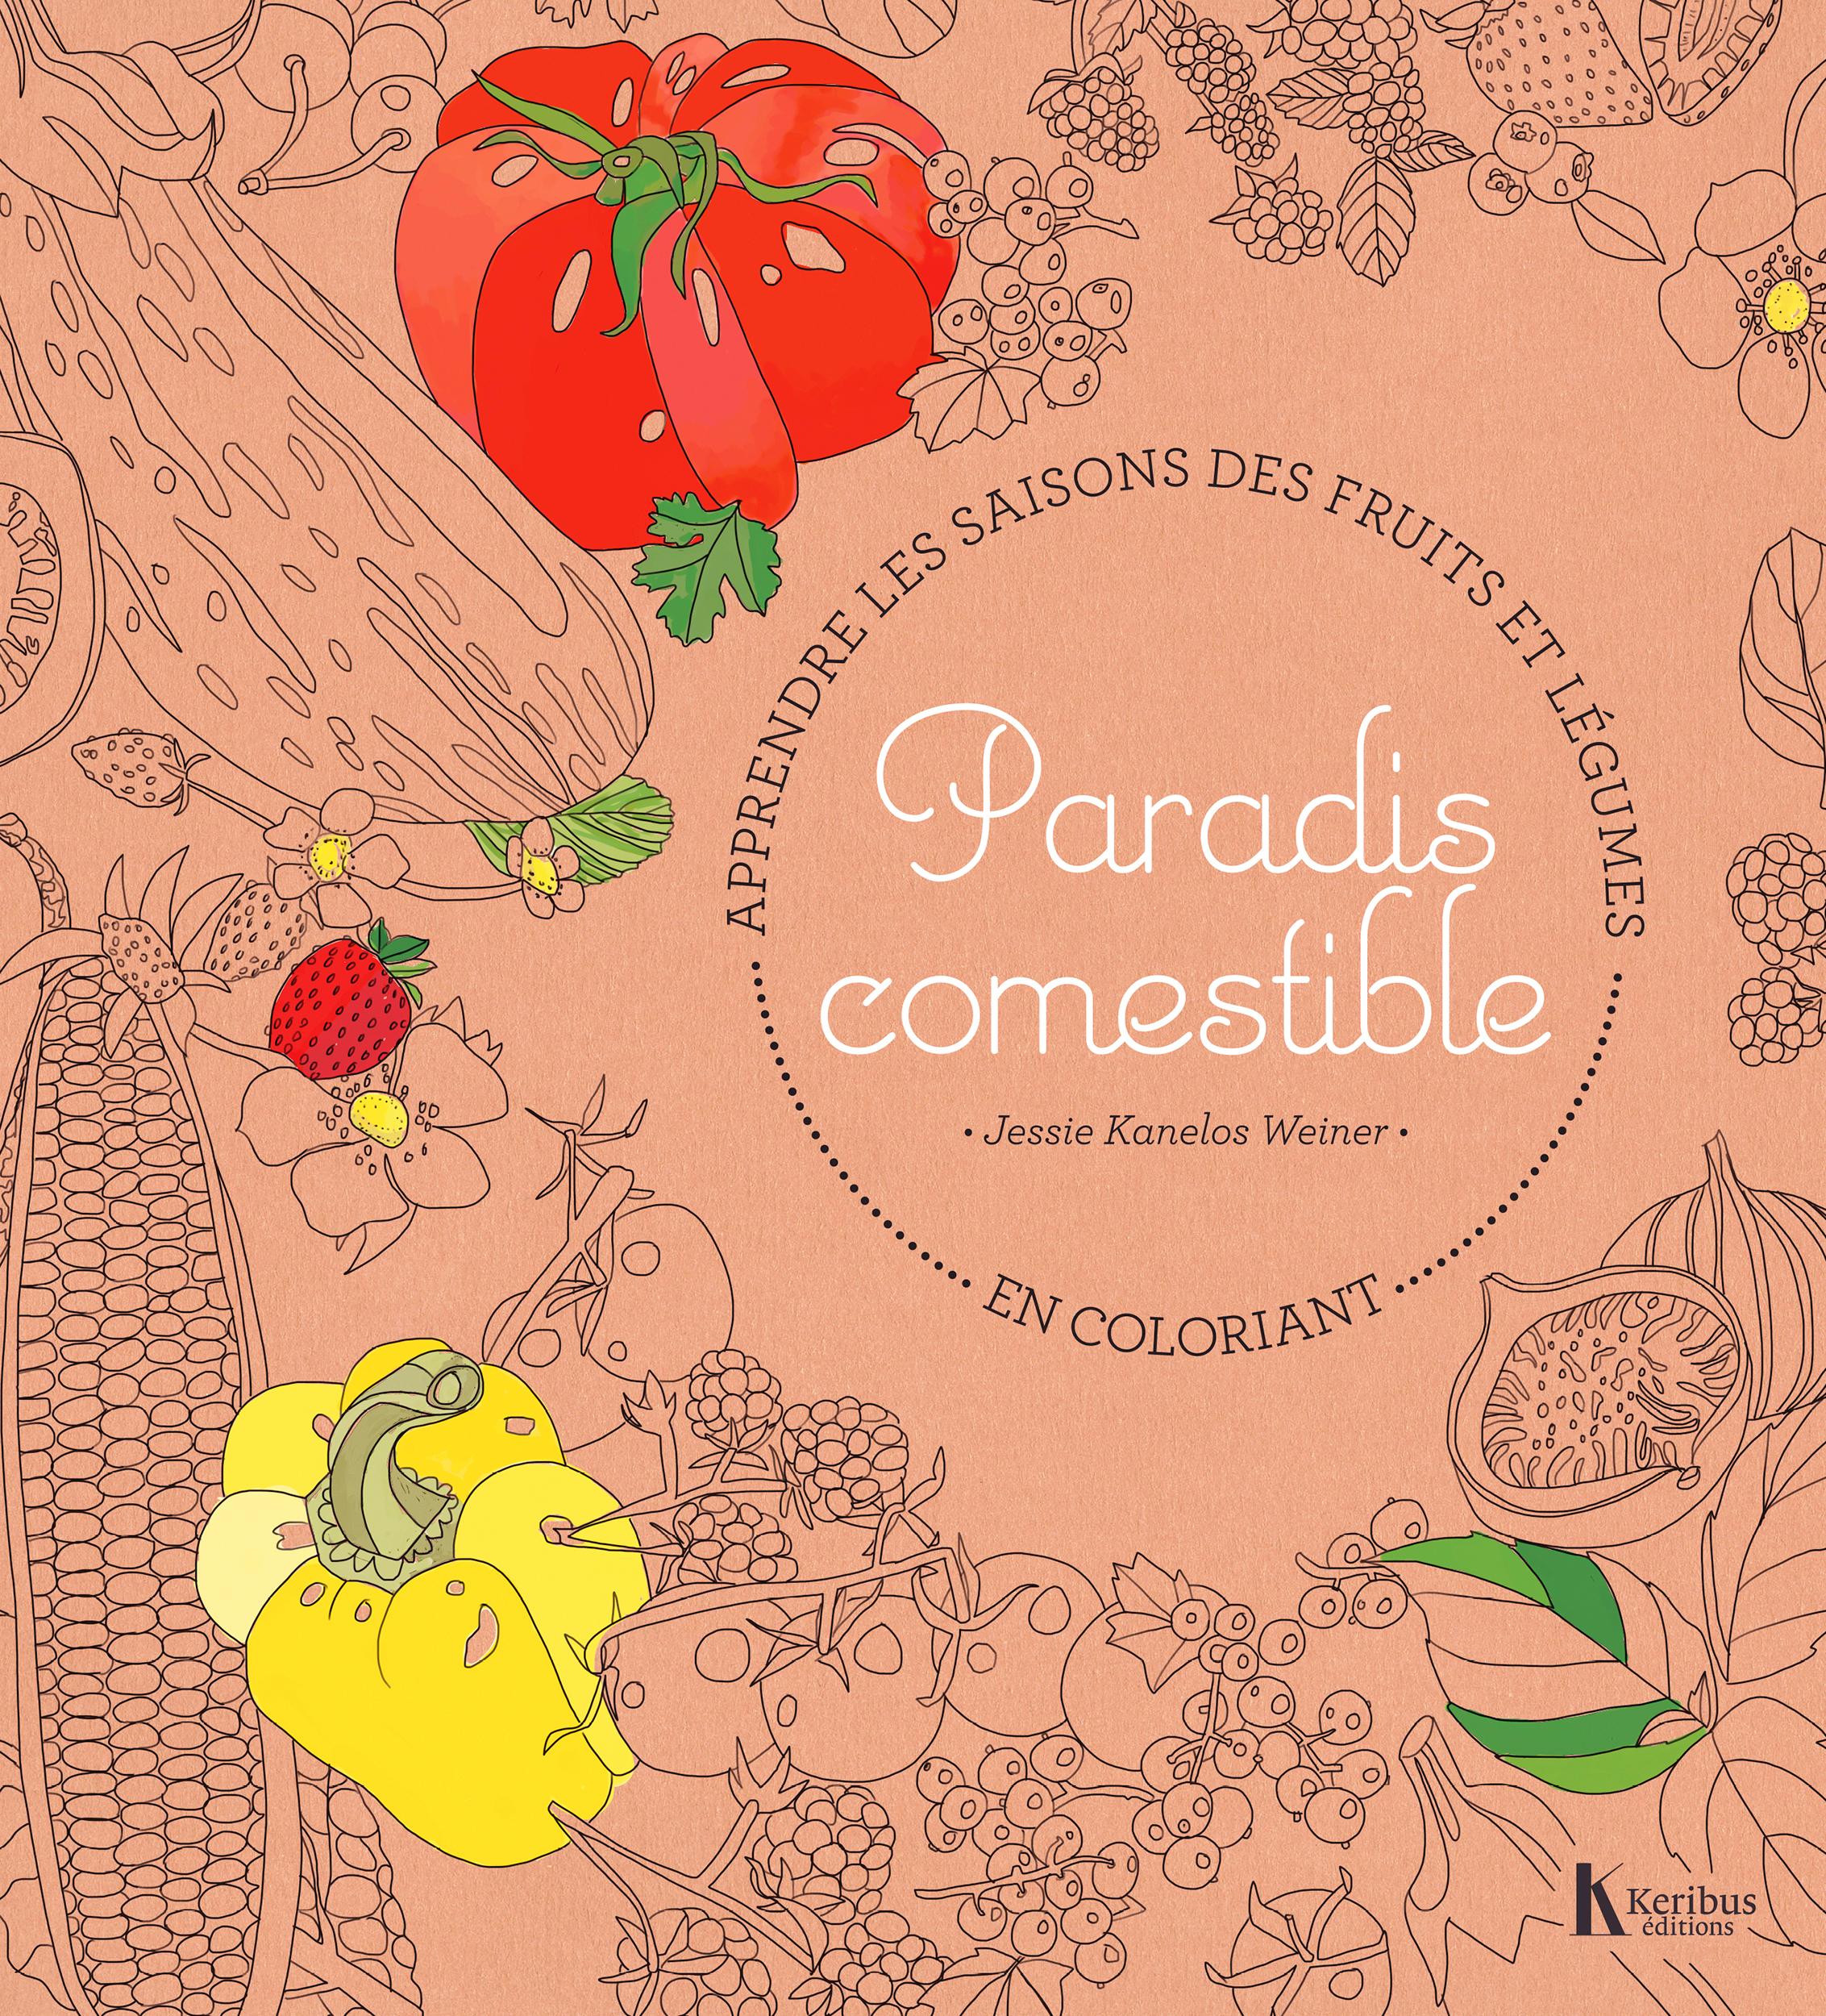 Paradis-Com-Couv-Keribus-editions